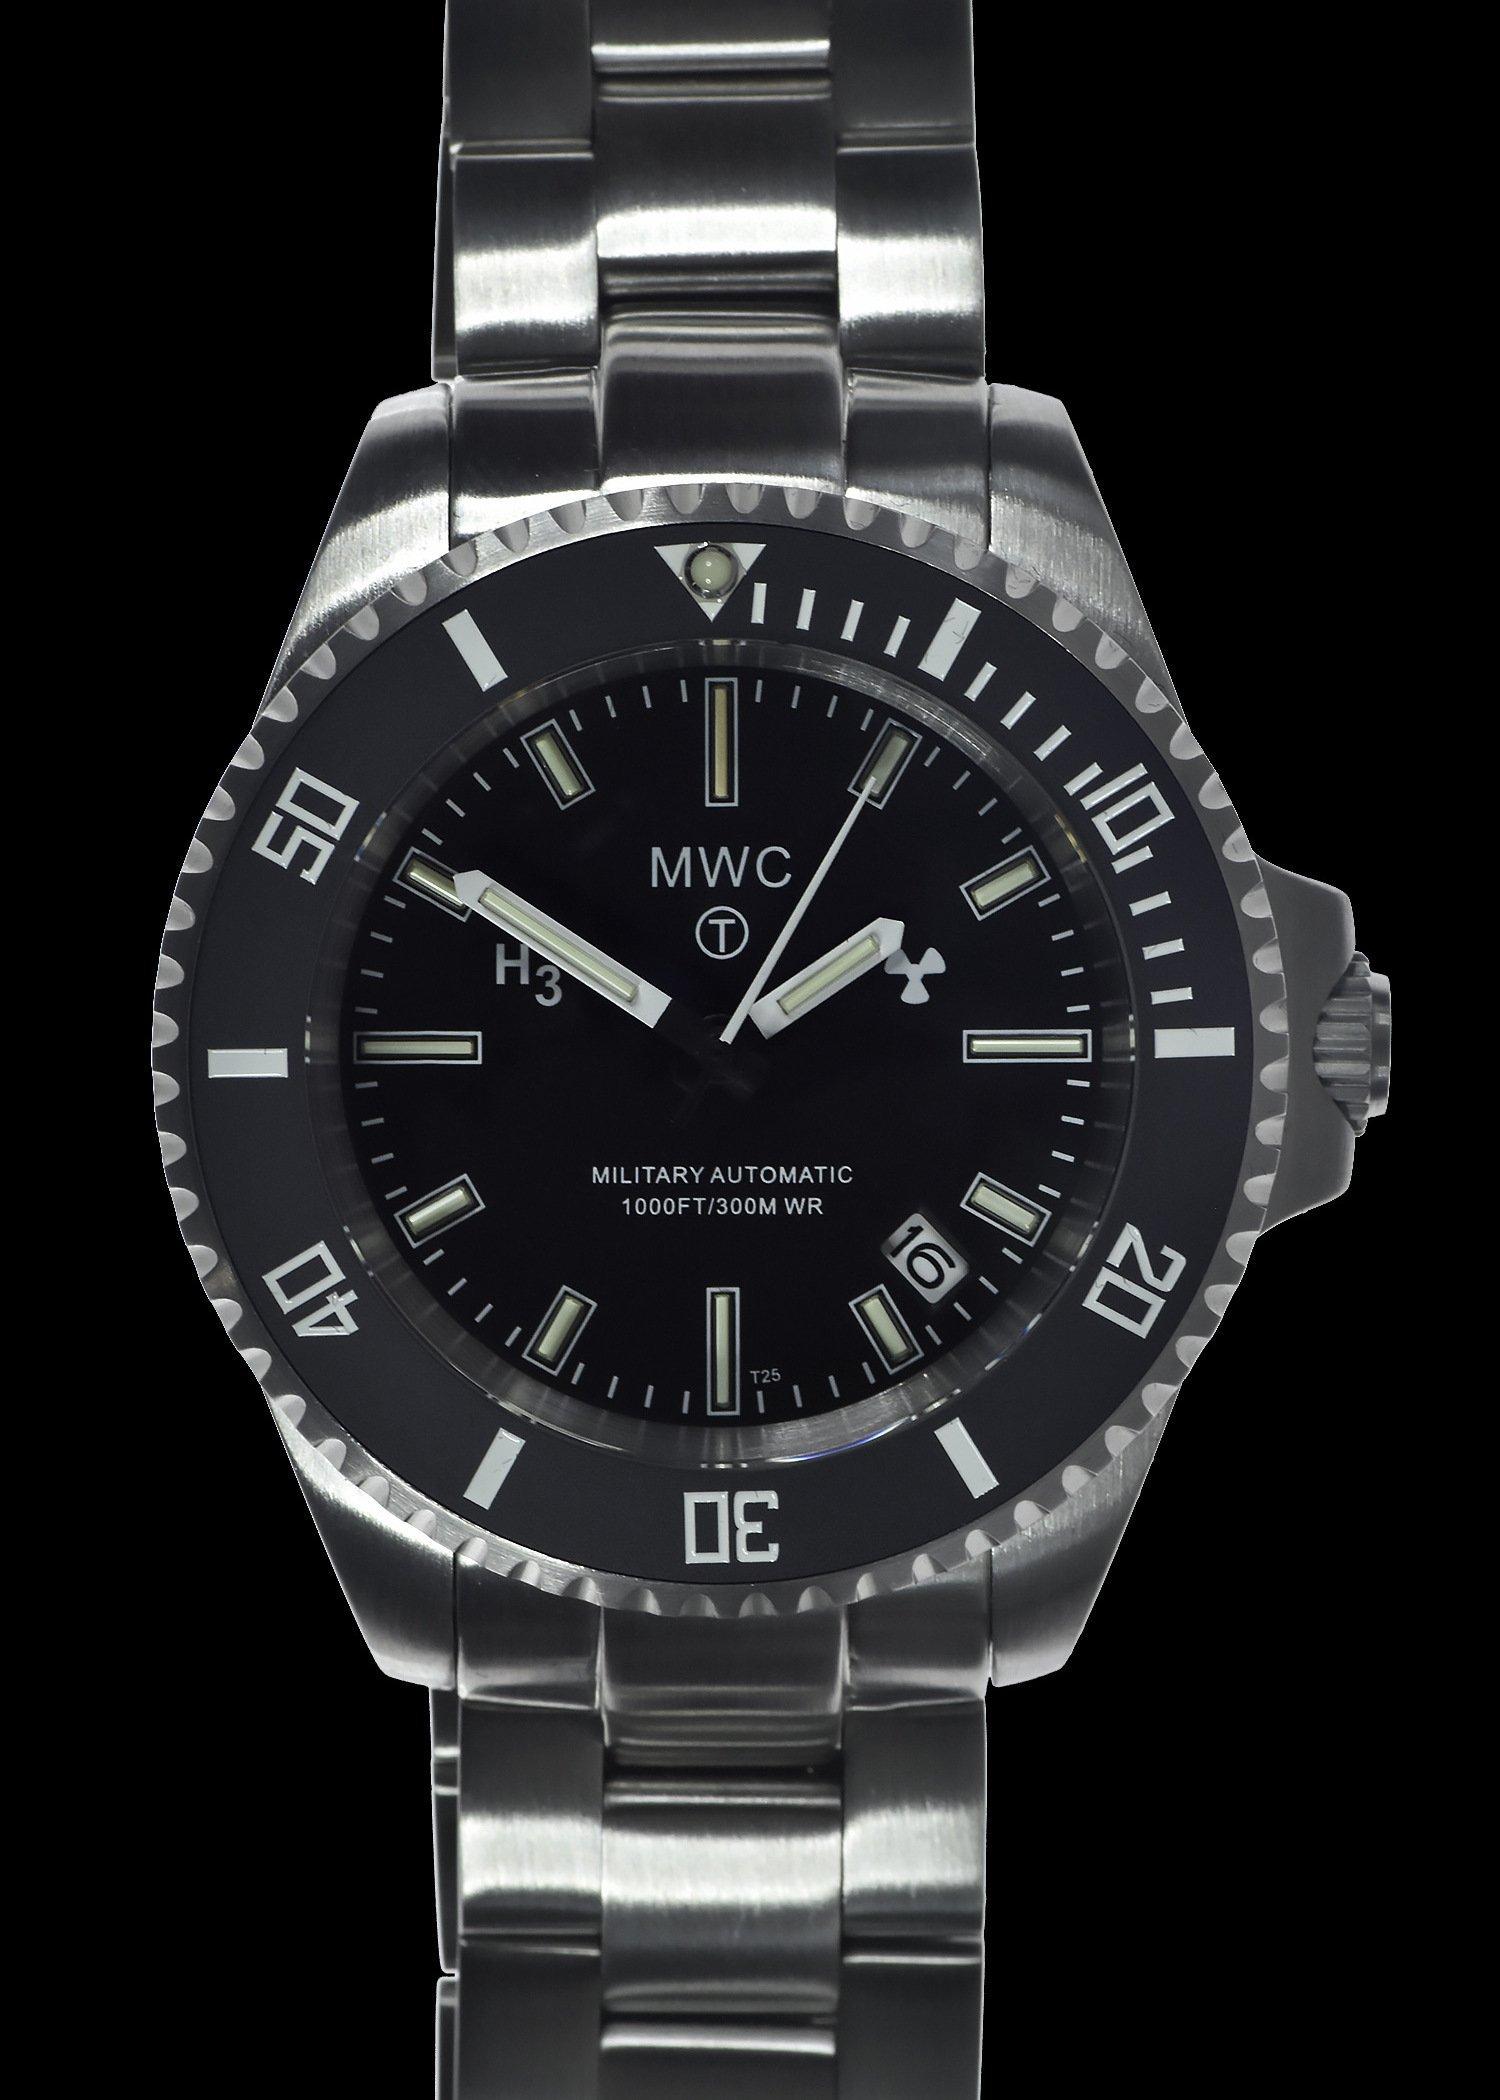 Водолазен часовник MWC 300m Automatic Tritium GTLS Military Divers - MWC